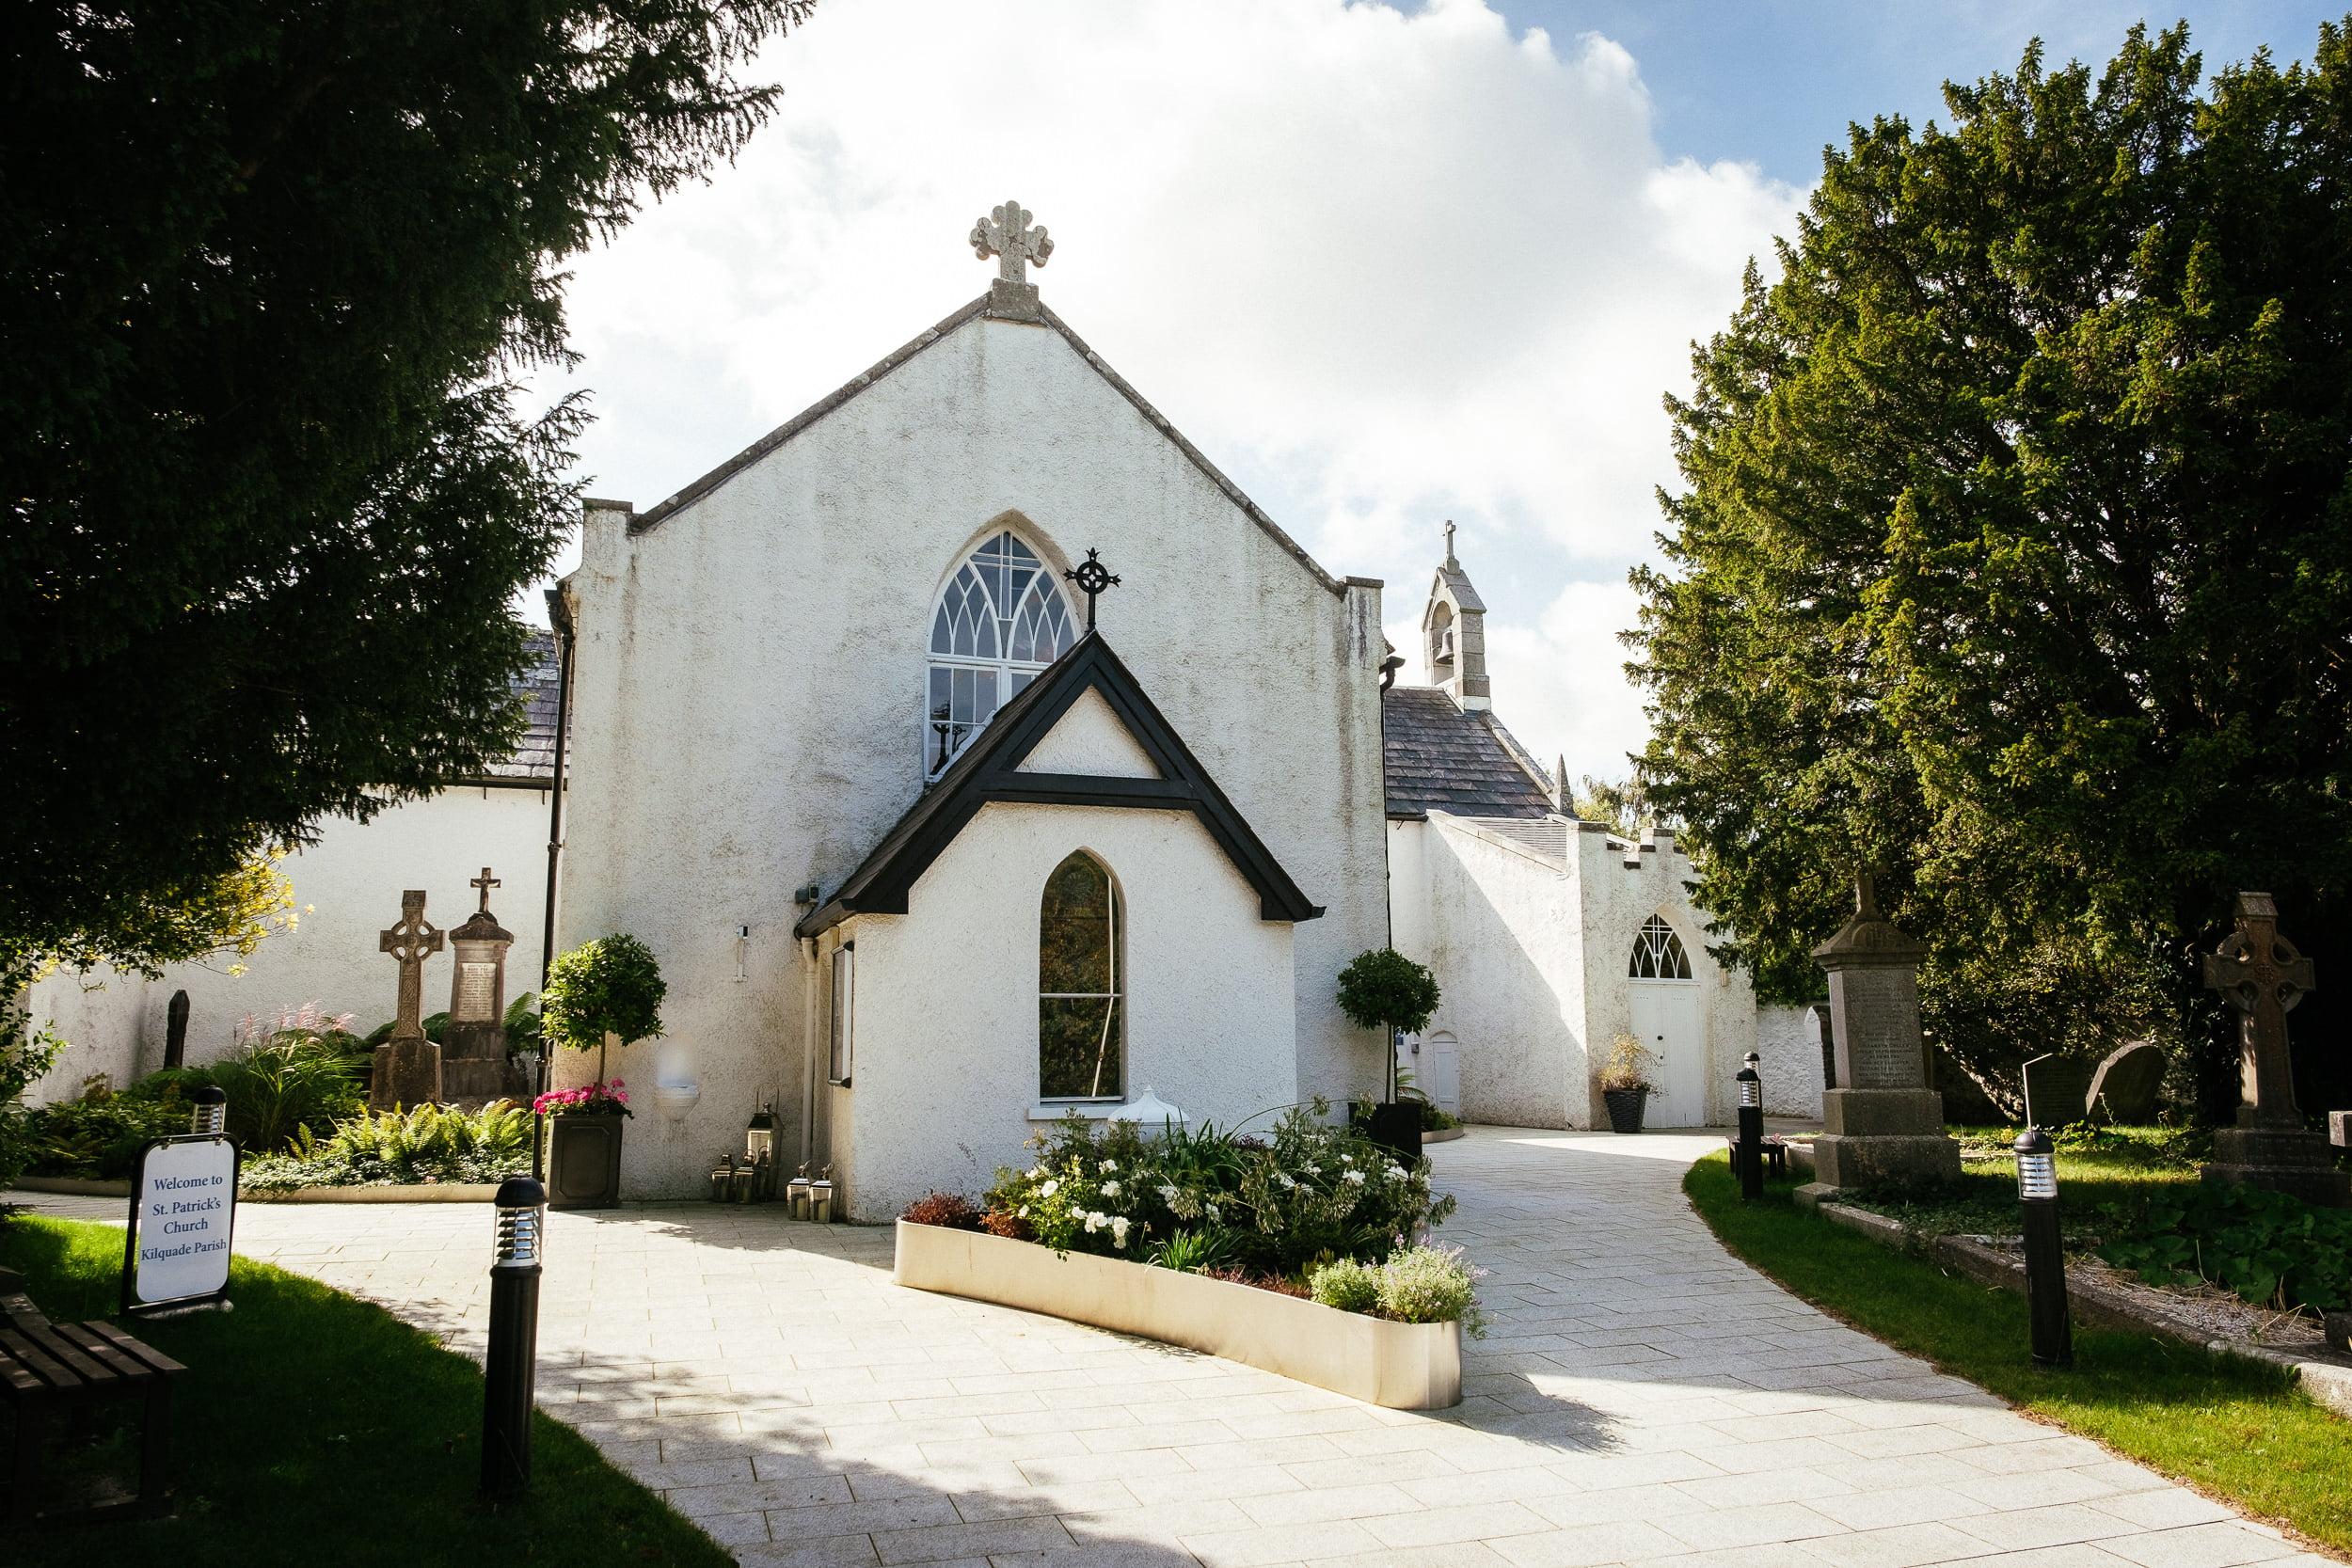 St. Patrick's Church, Kilquade